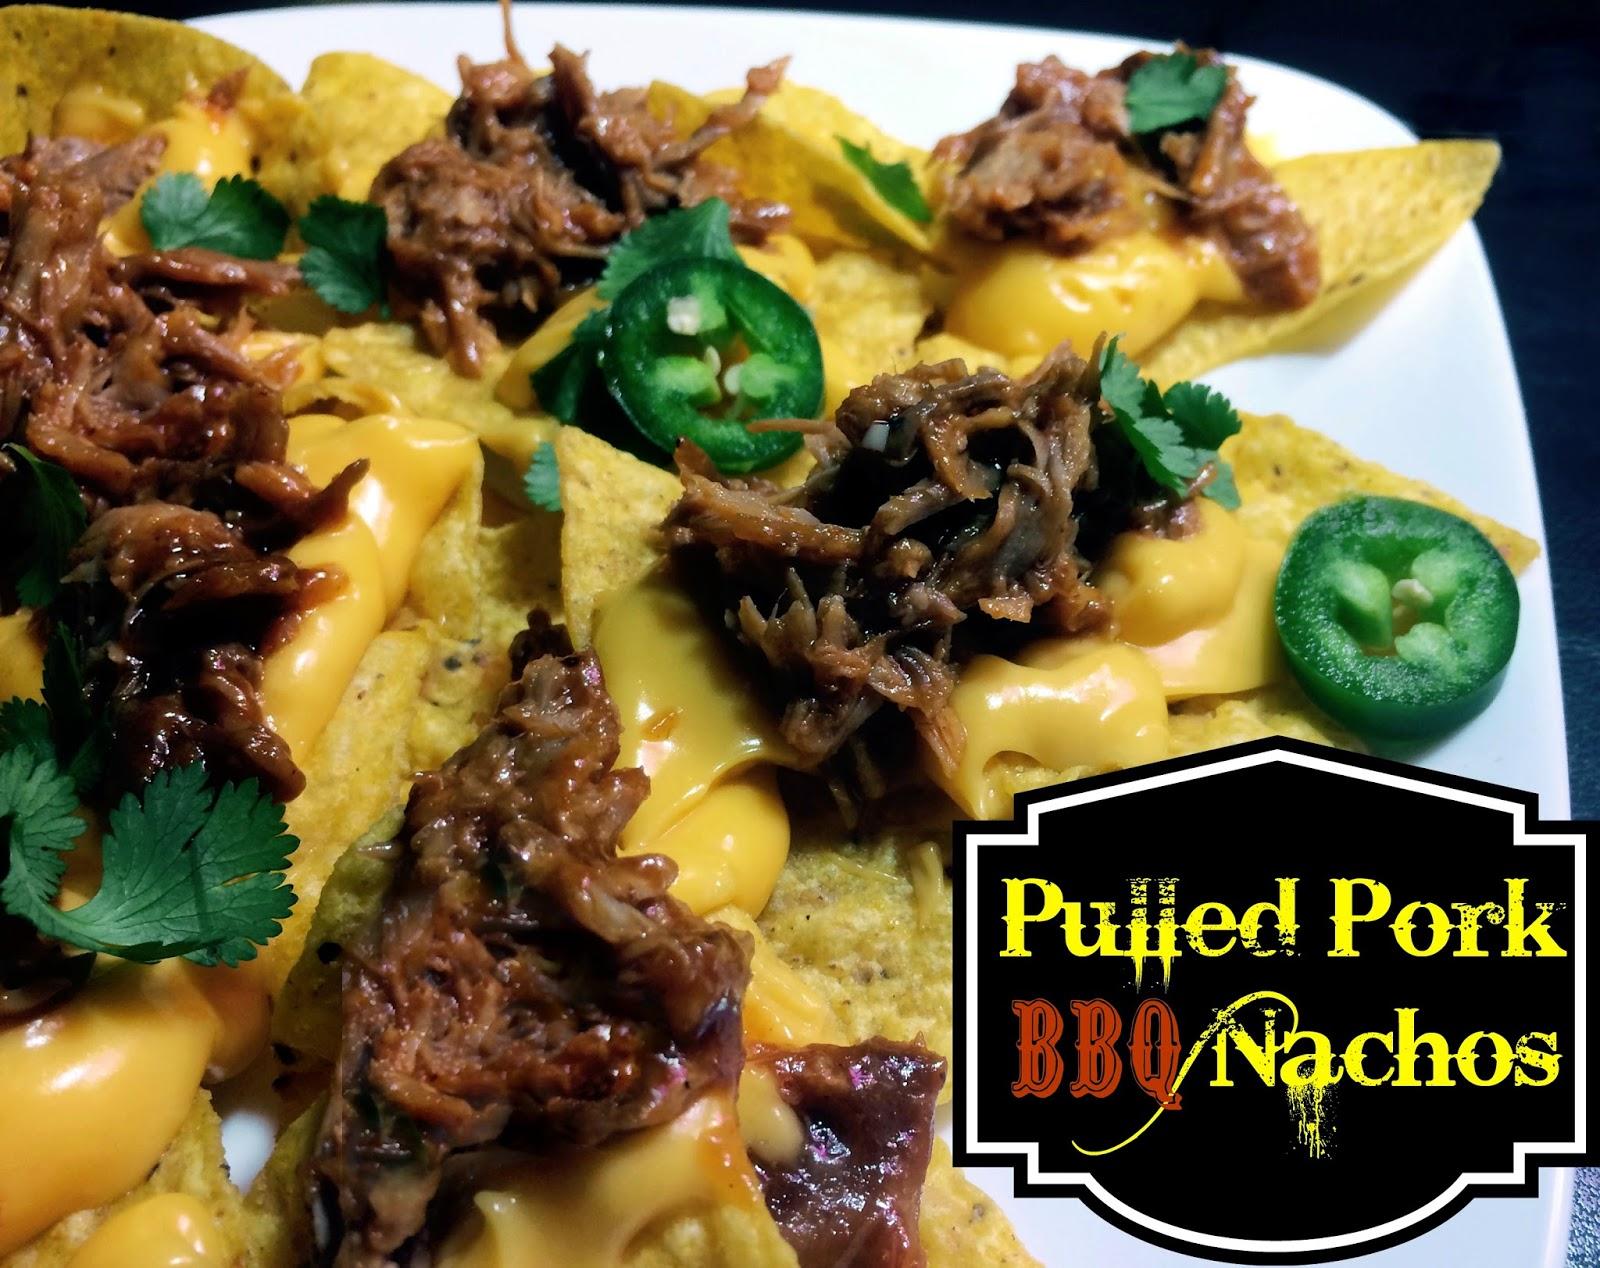 Pulled Pork BBQ Nachos | Aunt Bee's Recipes